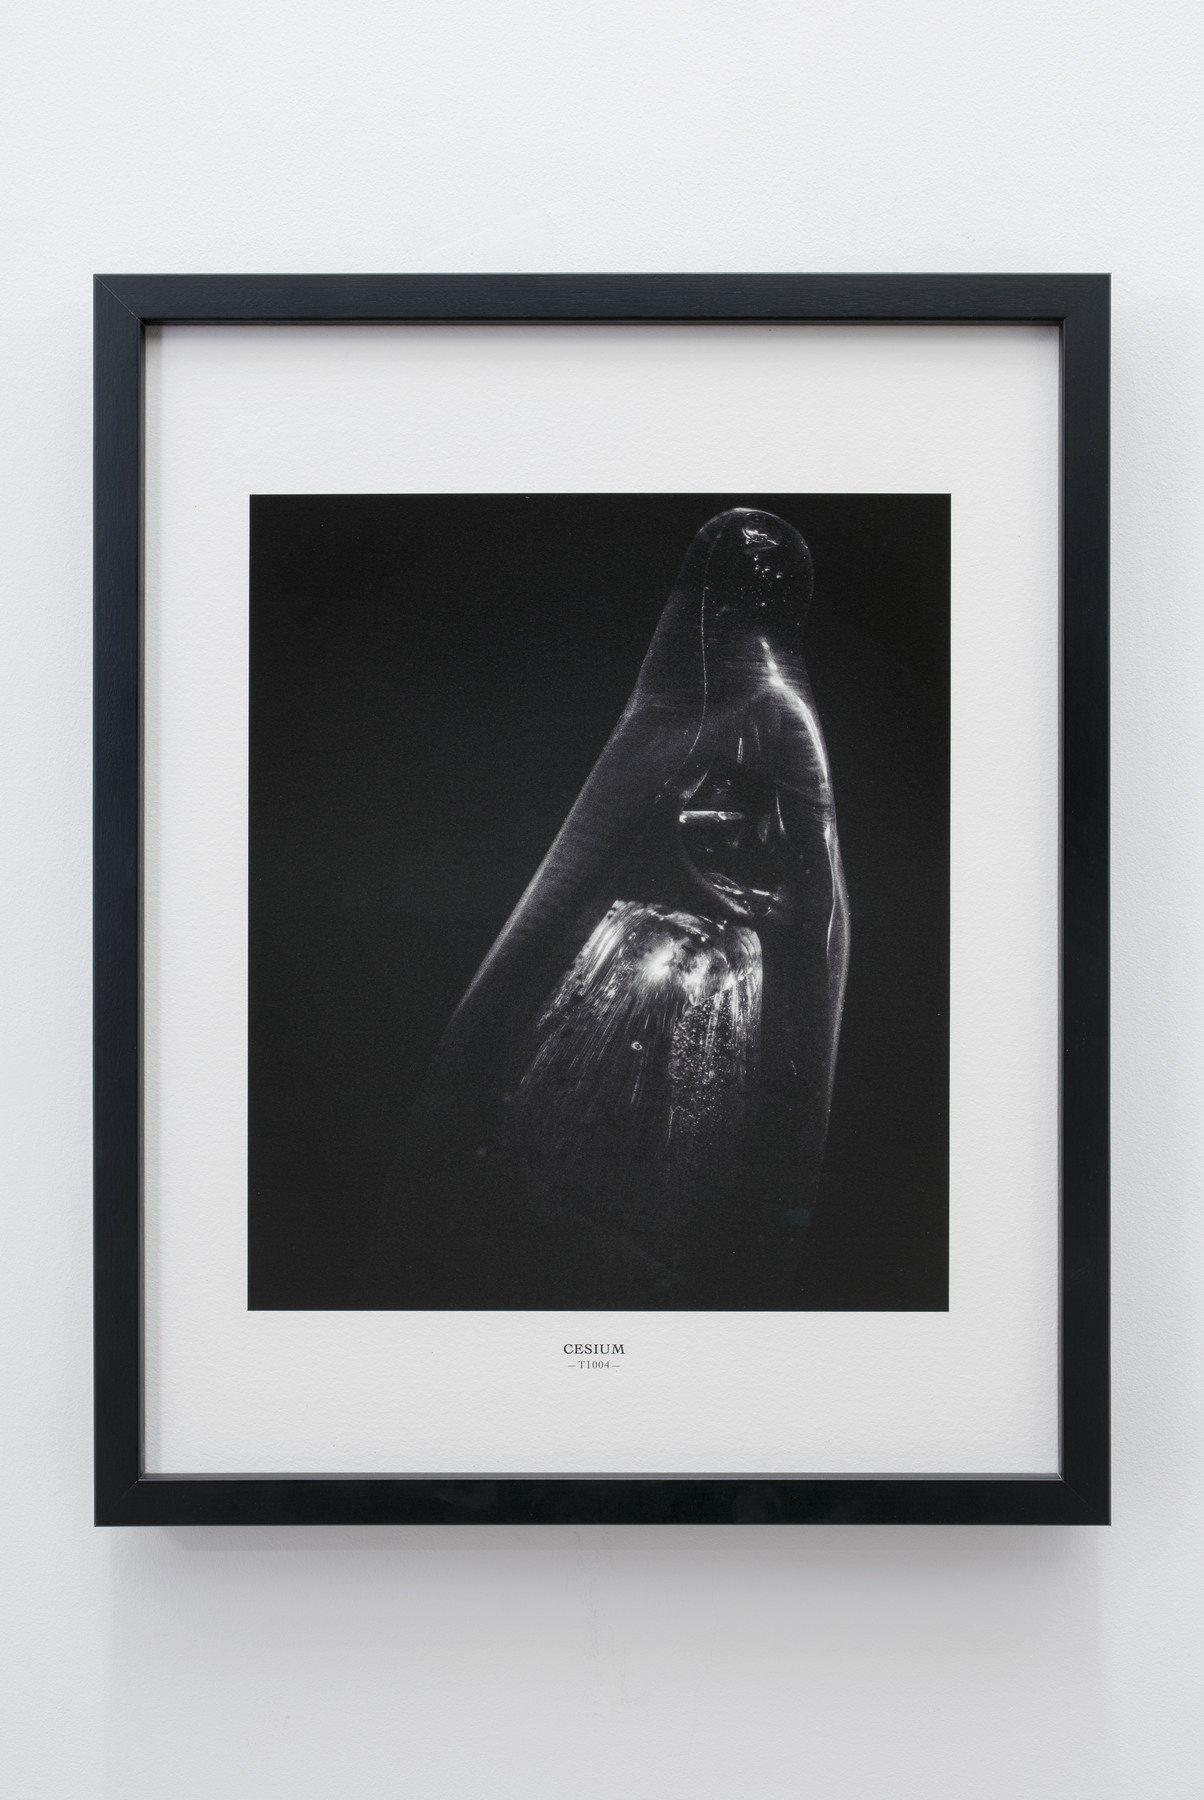 Melik Ohanian, Portrait of Duration — Cesium Series (T1004), 2015, Black and white photograph, 53 x 43 x 5cm (framed), 1_1 + 1 AP